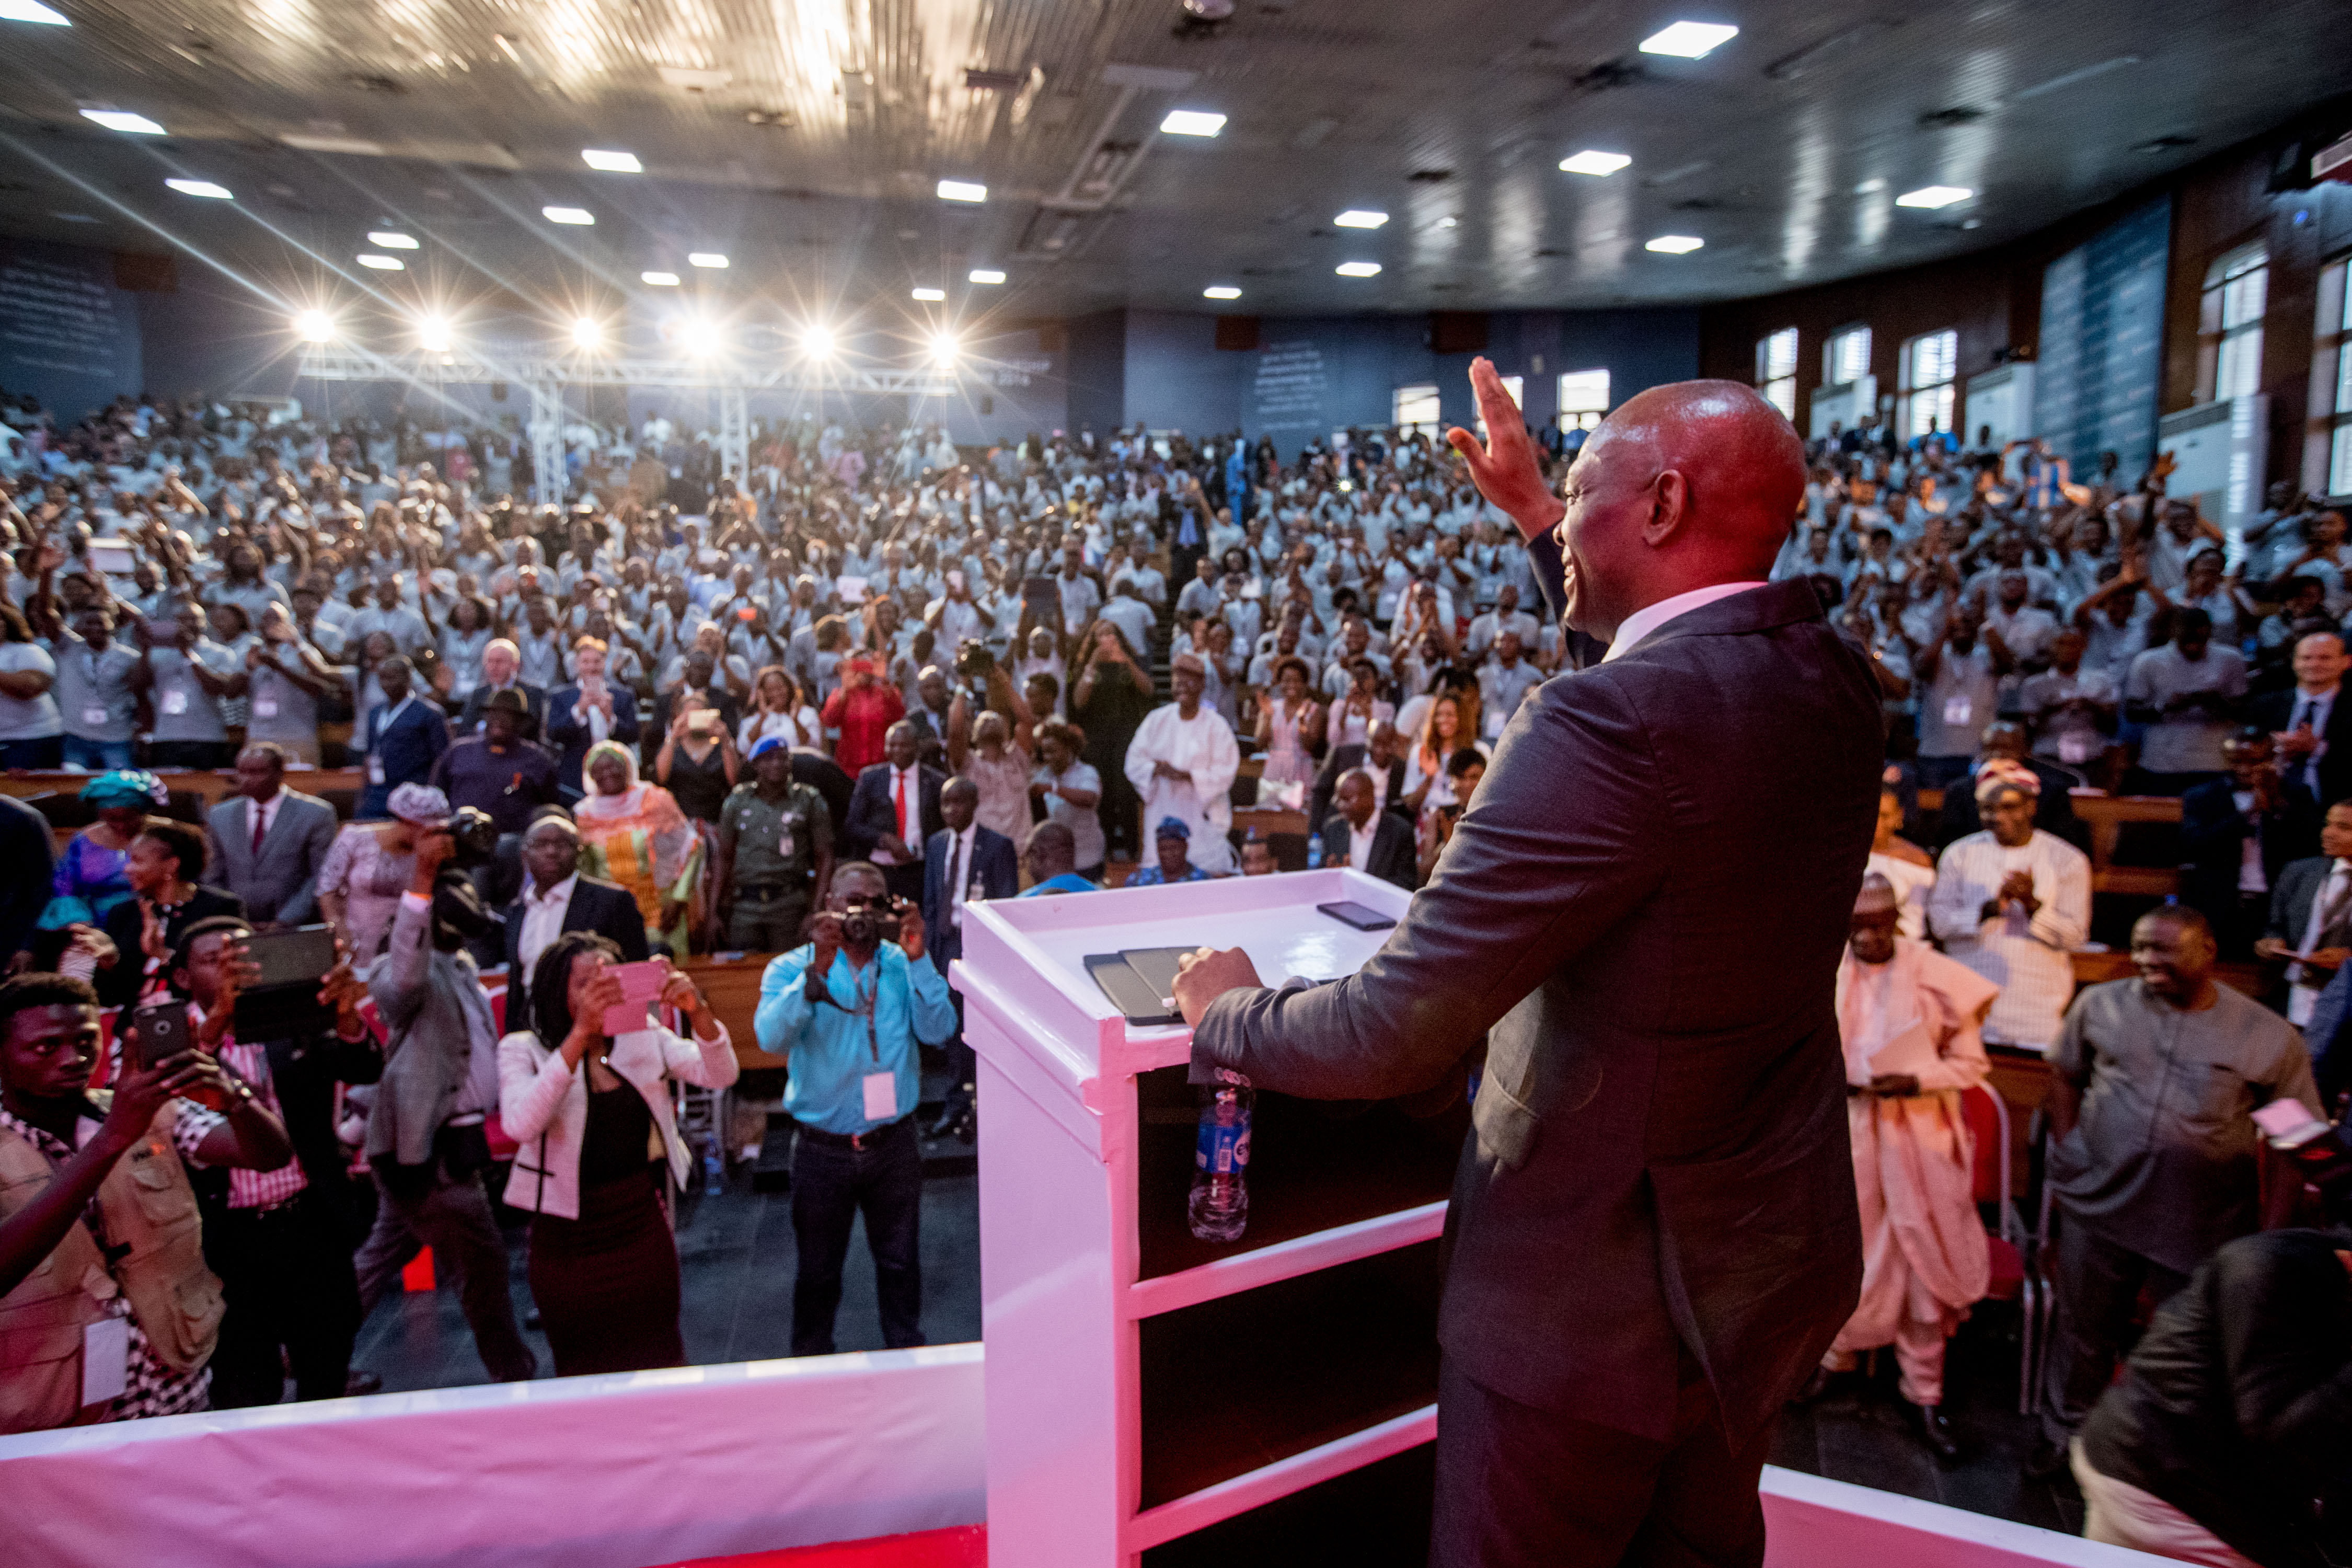 Tony O. Elumelu addressing the Tony Elumelu Entrepreneurs at the Tony Elumelu Foundation Entrepreneurship Forum 2016, which held in Lagos, Nigeria in October.